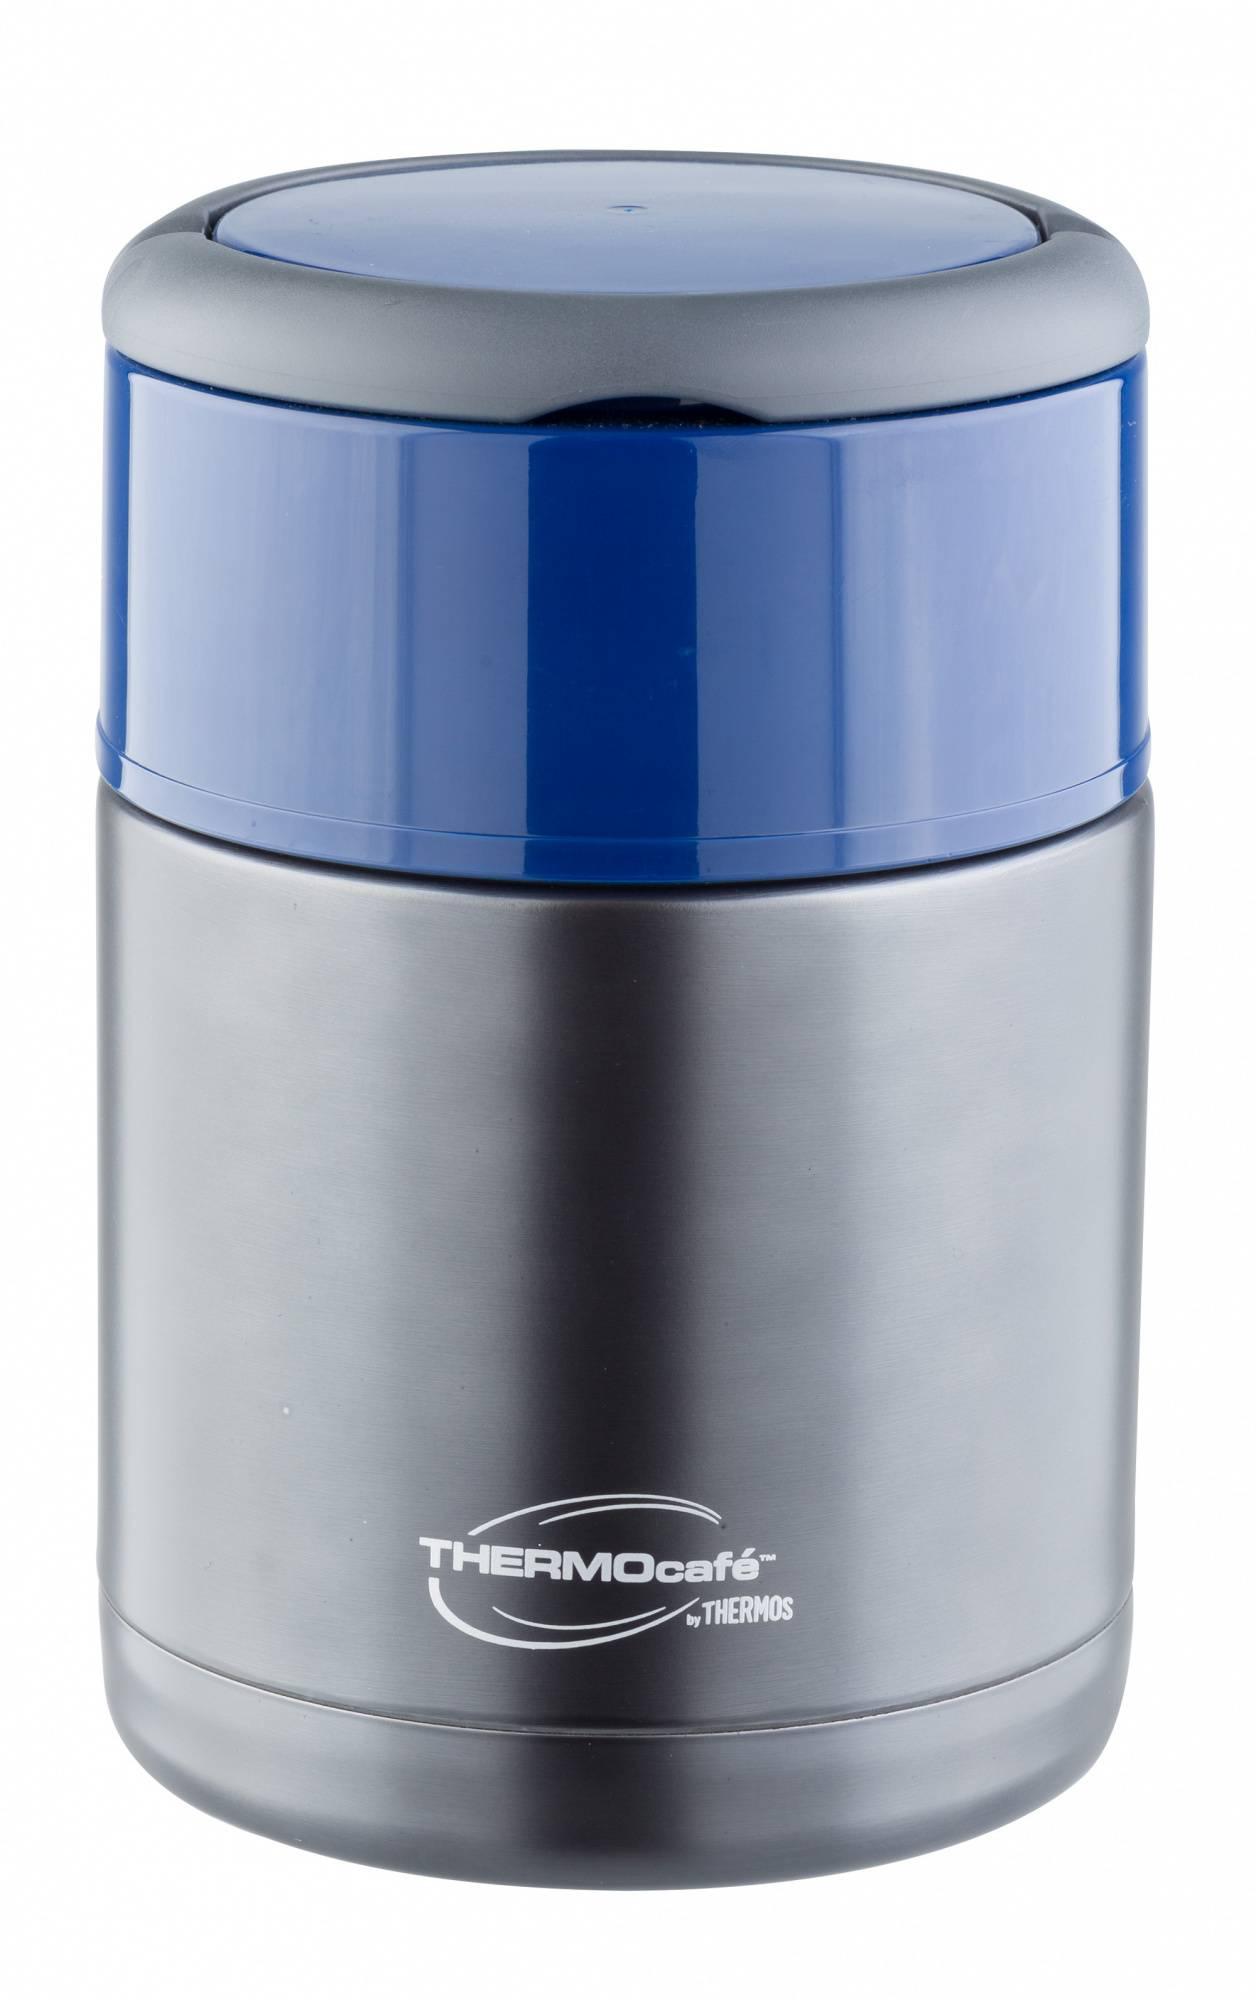 Термос Thermos THERMOcafe TS3506 Navy серый - фото 1